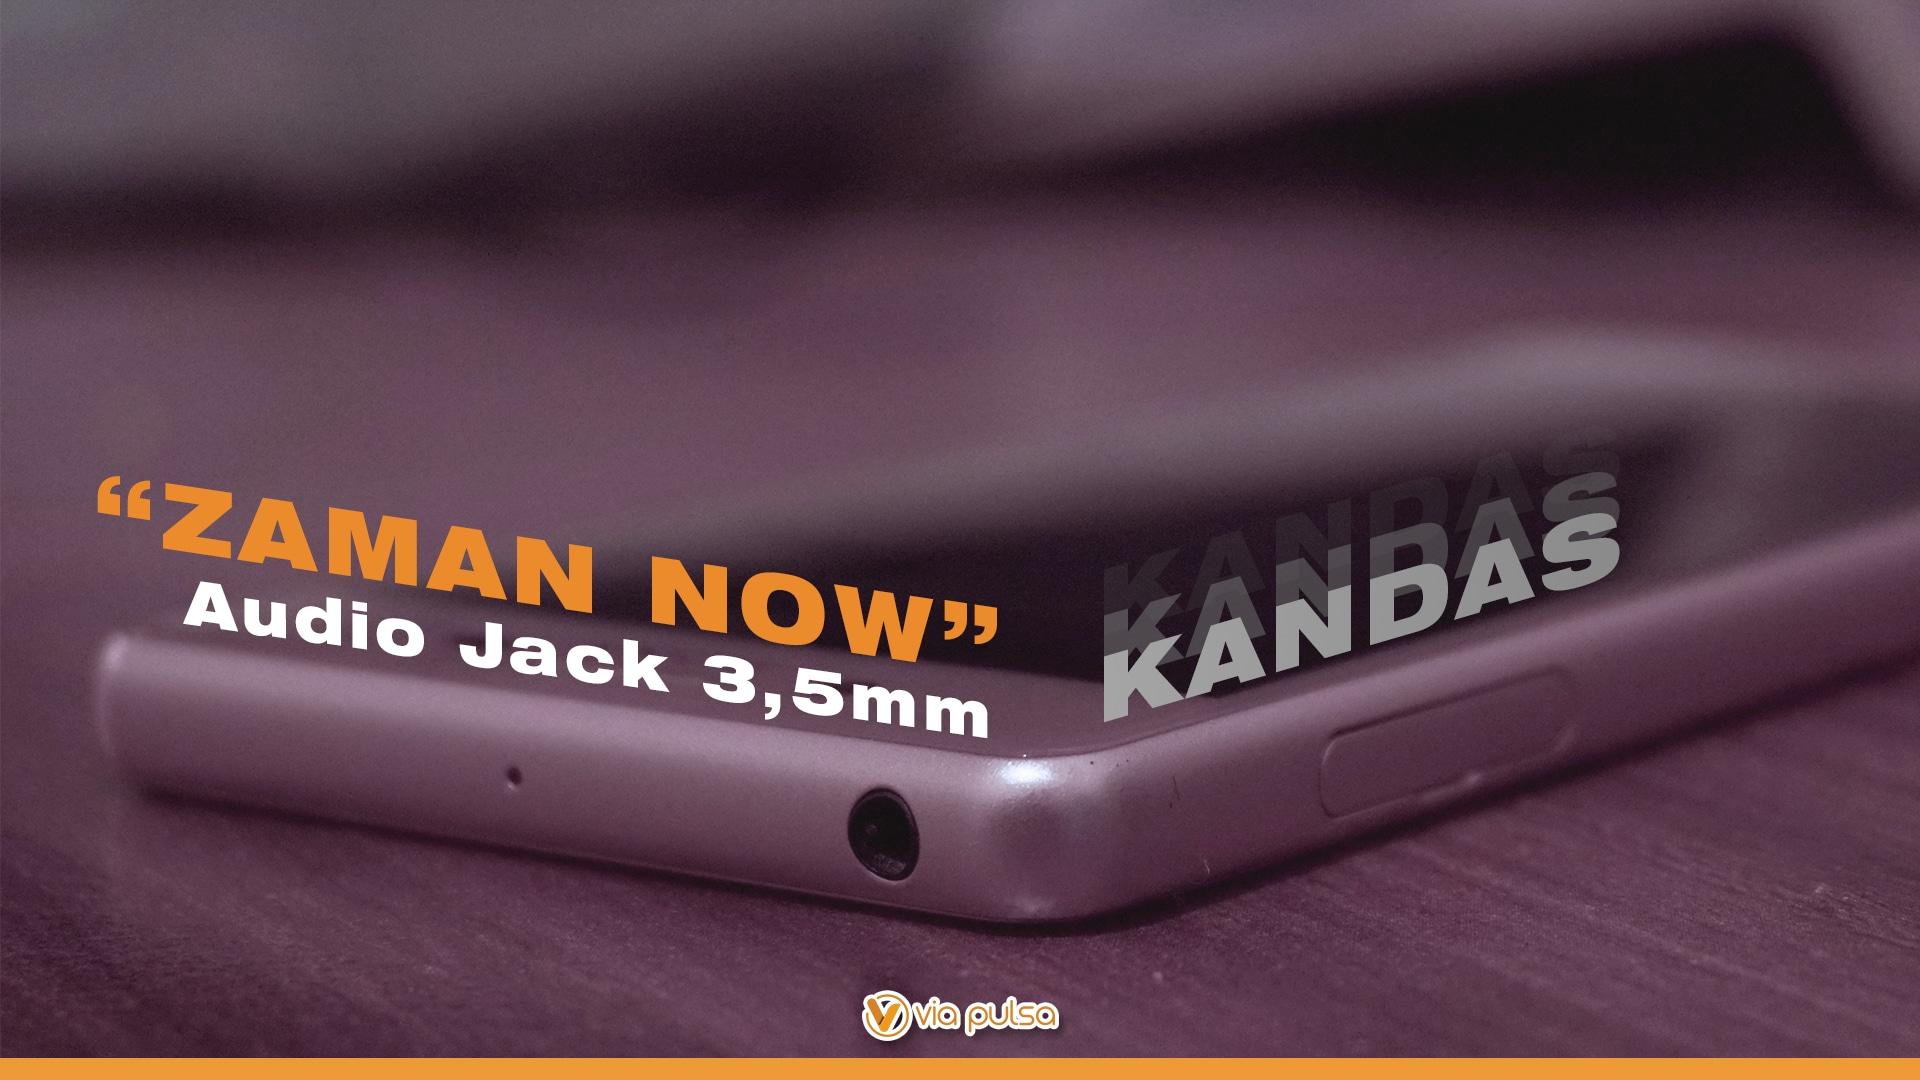 Background Artikel Audio Jack 3,5mm Kandas